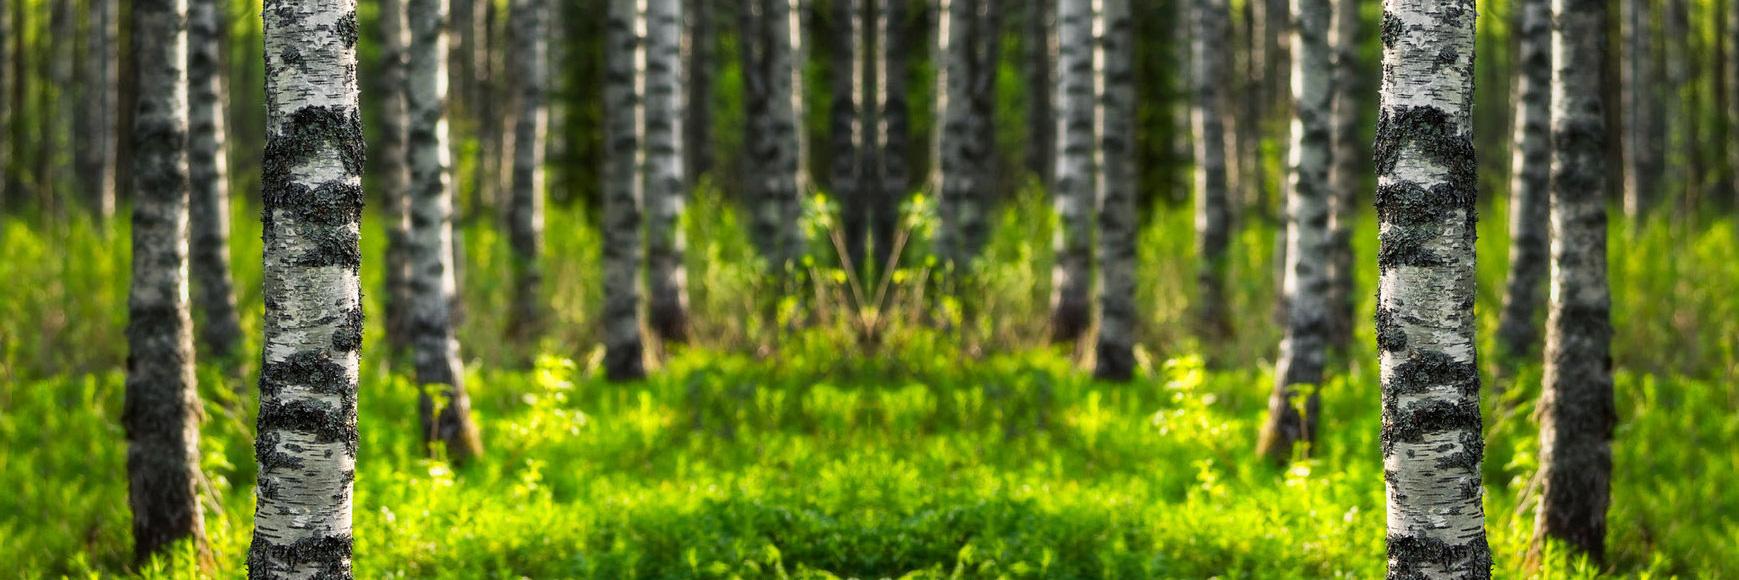 foresta-siberiana